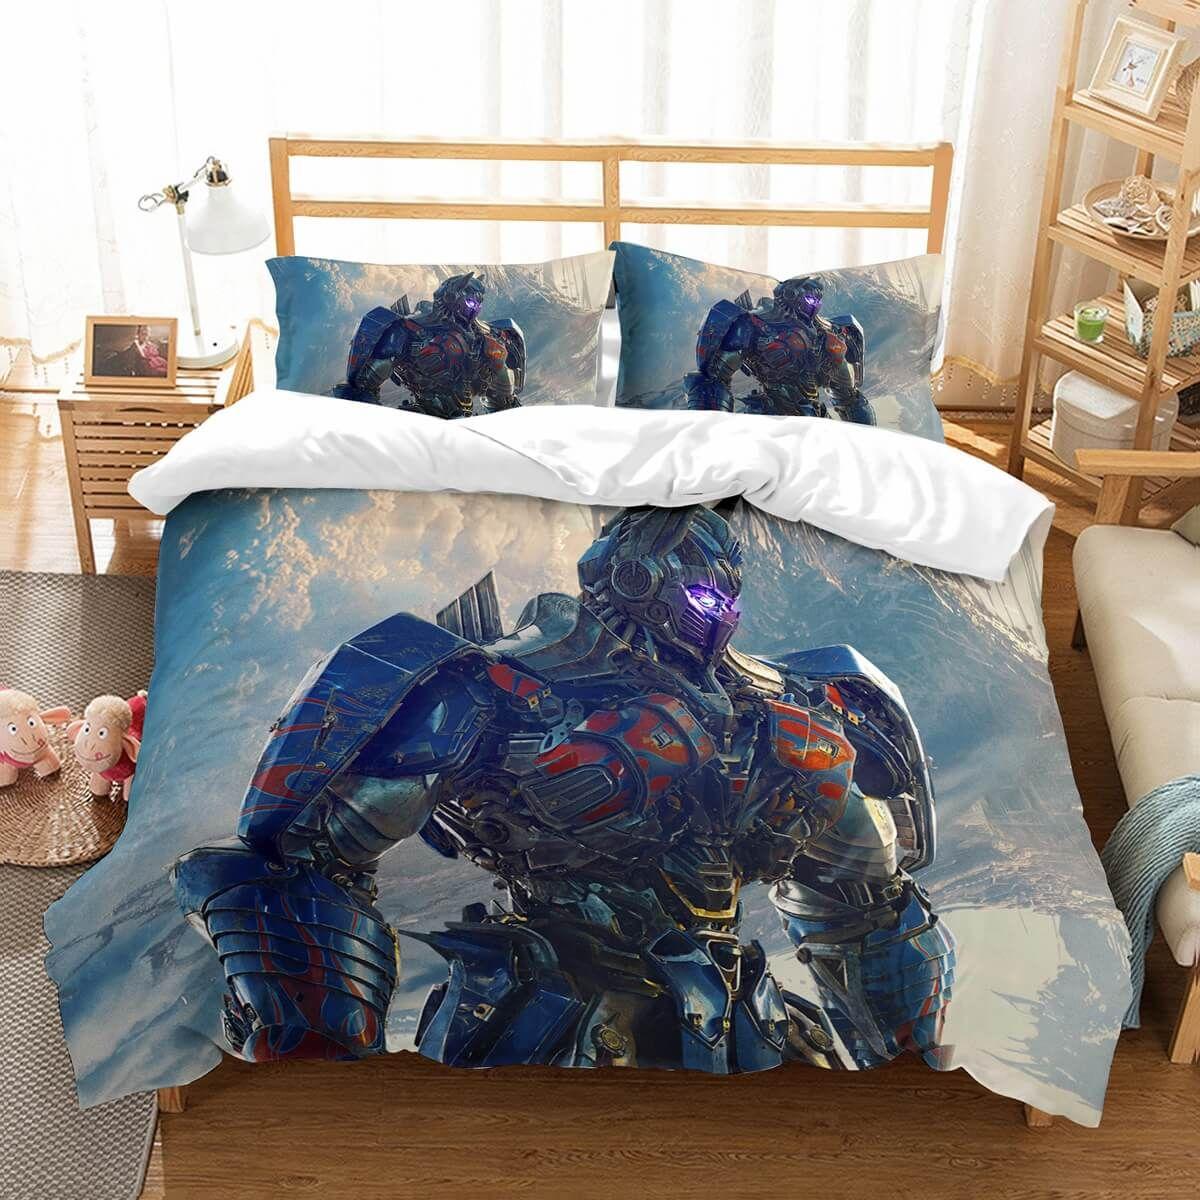 Customize Transformers Bedding Set Duvet Cover Bedroom Bedlinen